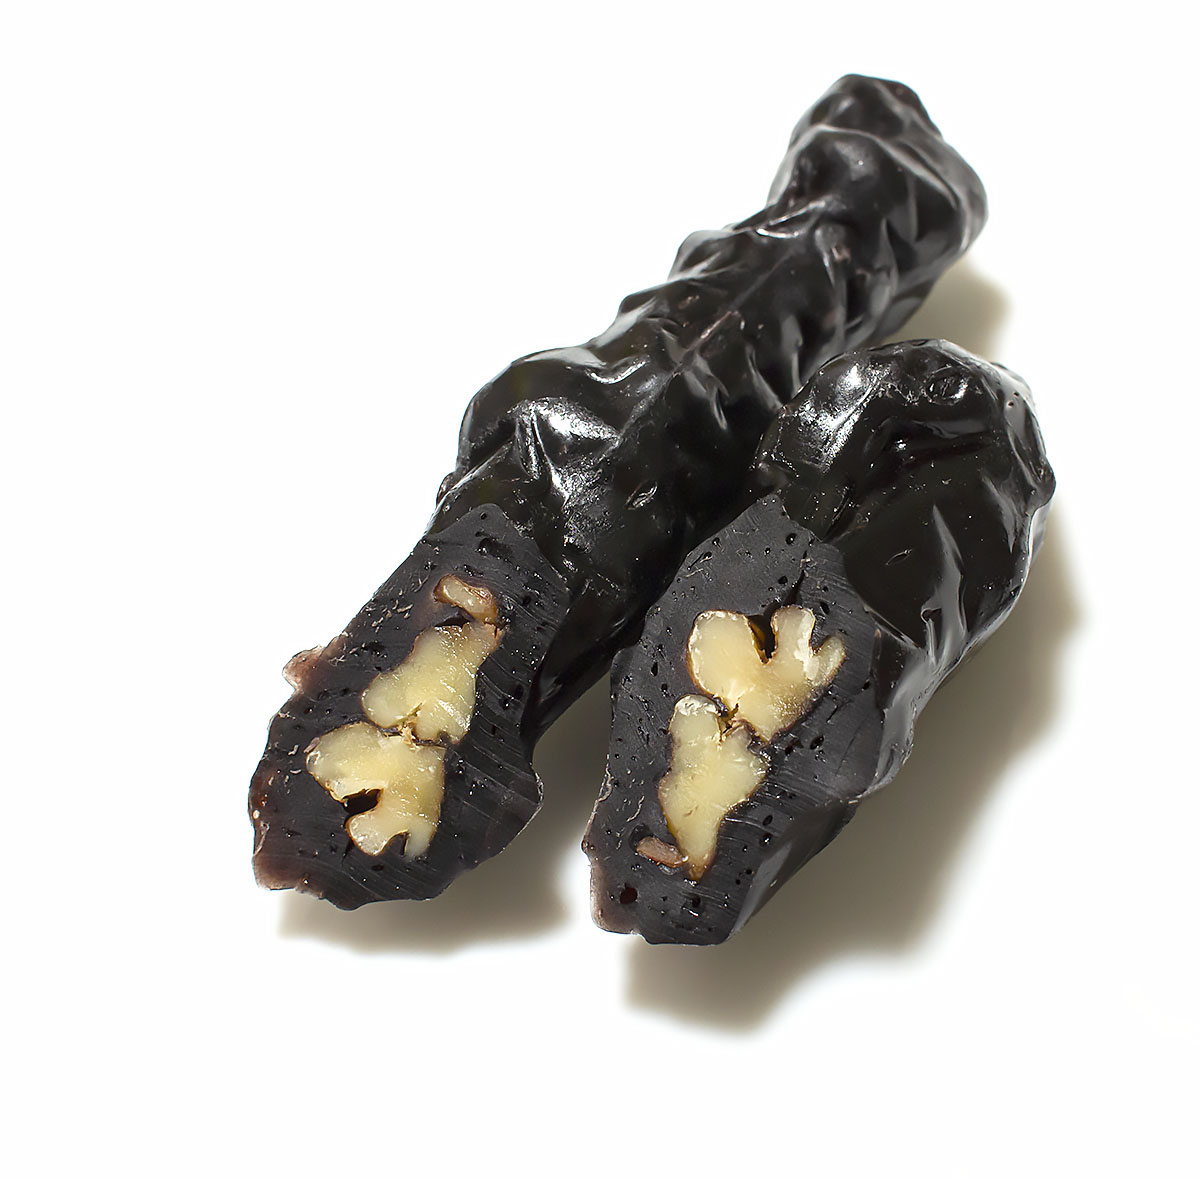 Фото - Чурчхела мини гранатовая с грецким орехом, без сахара, 45 г бисквит б ю александров брауни с грецким орехом и карамелью 40 г